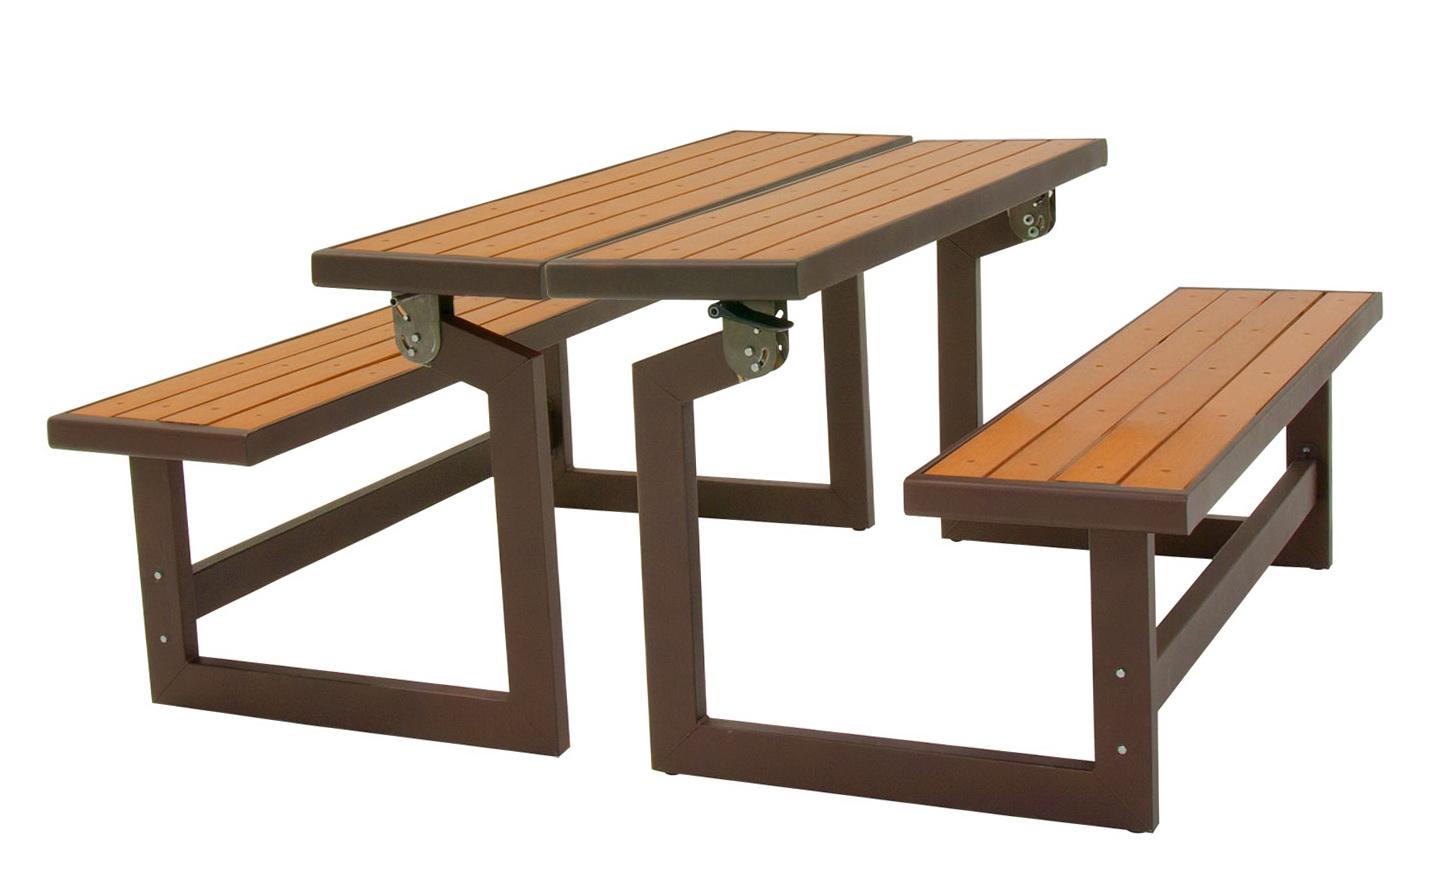 Lifetime Convertible Bench Faux Wood Construction # 60054